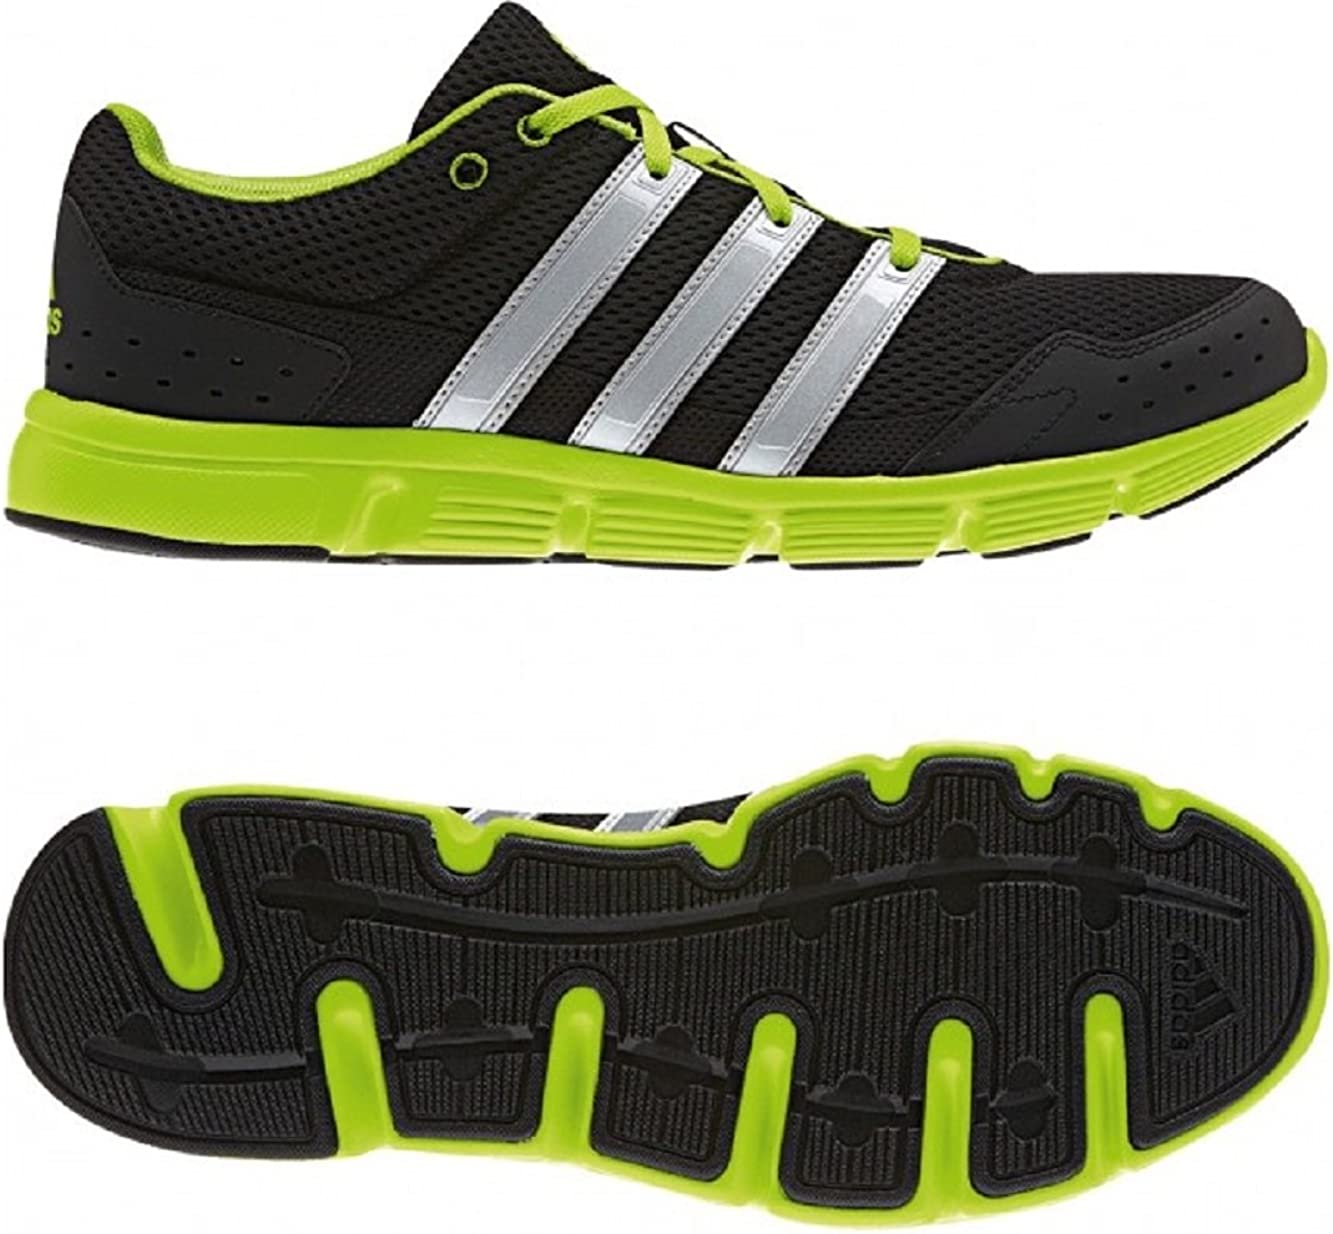 Series Running Shoes, Black/Neon green